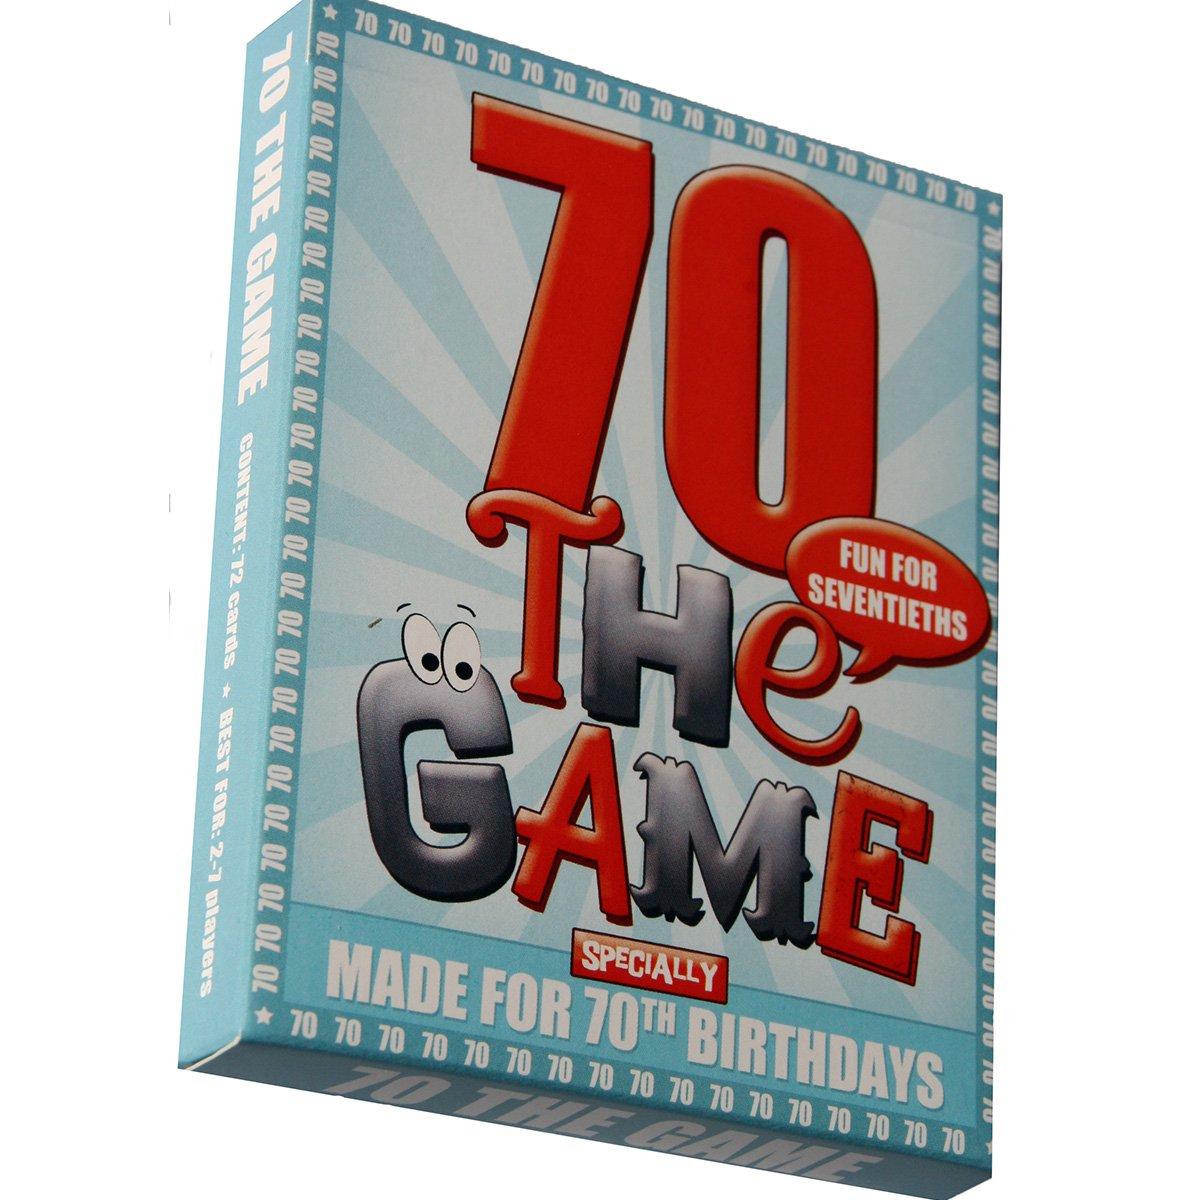 70TH BIRTHDAY GAME